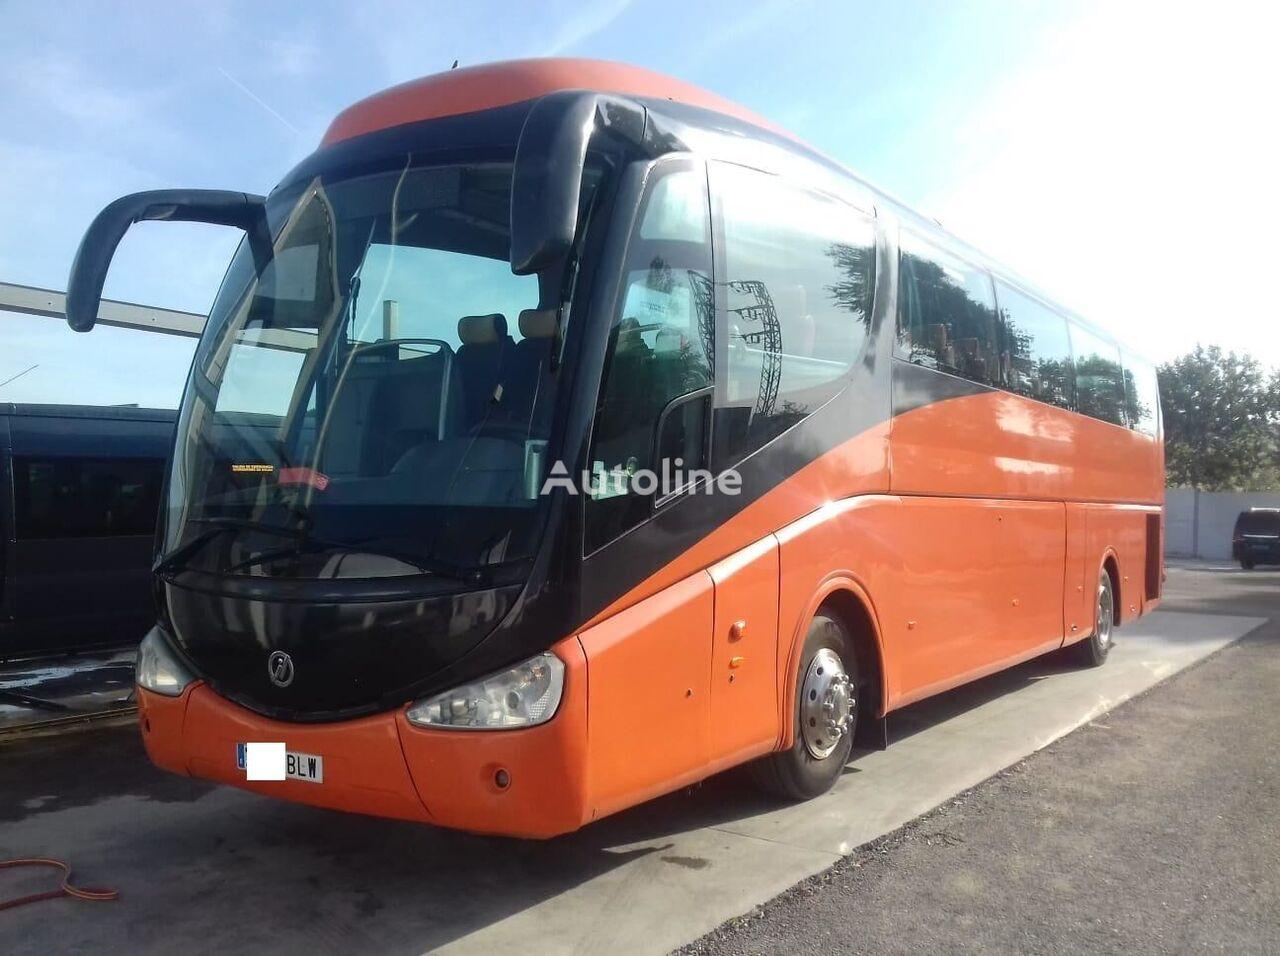 IVECO IRIZAR PB ALTO +57 PLAZAS +   460000km REALES coach bus